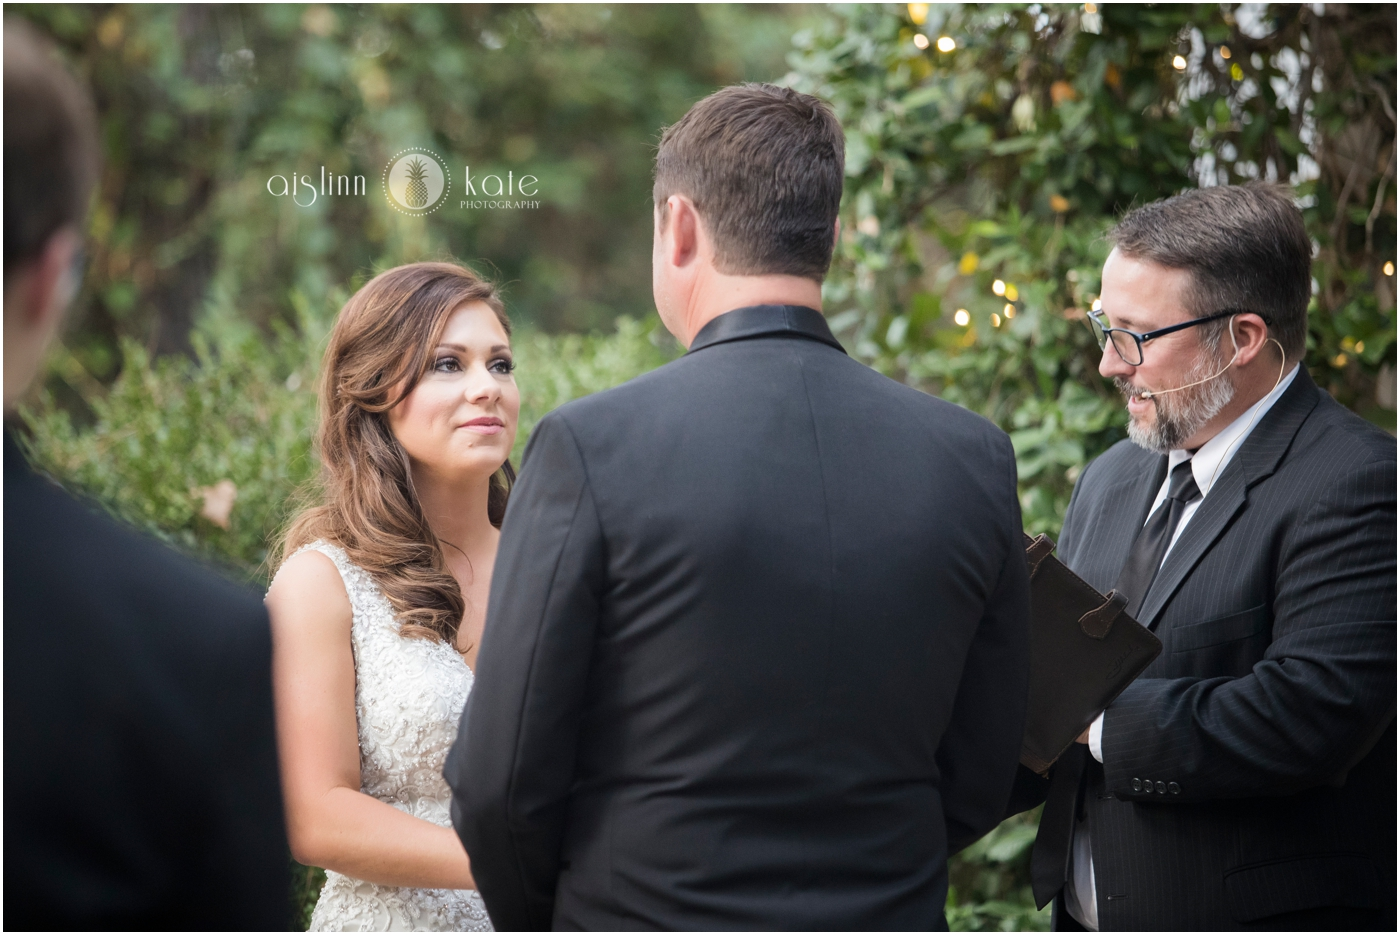 Pensacola-Destin-Wedding-Photographer_9320.jpg